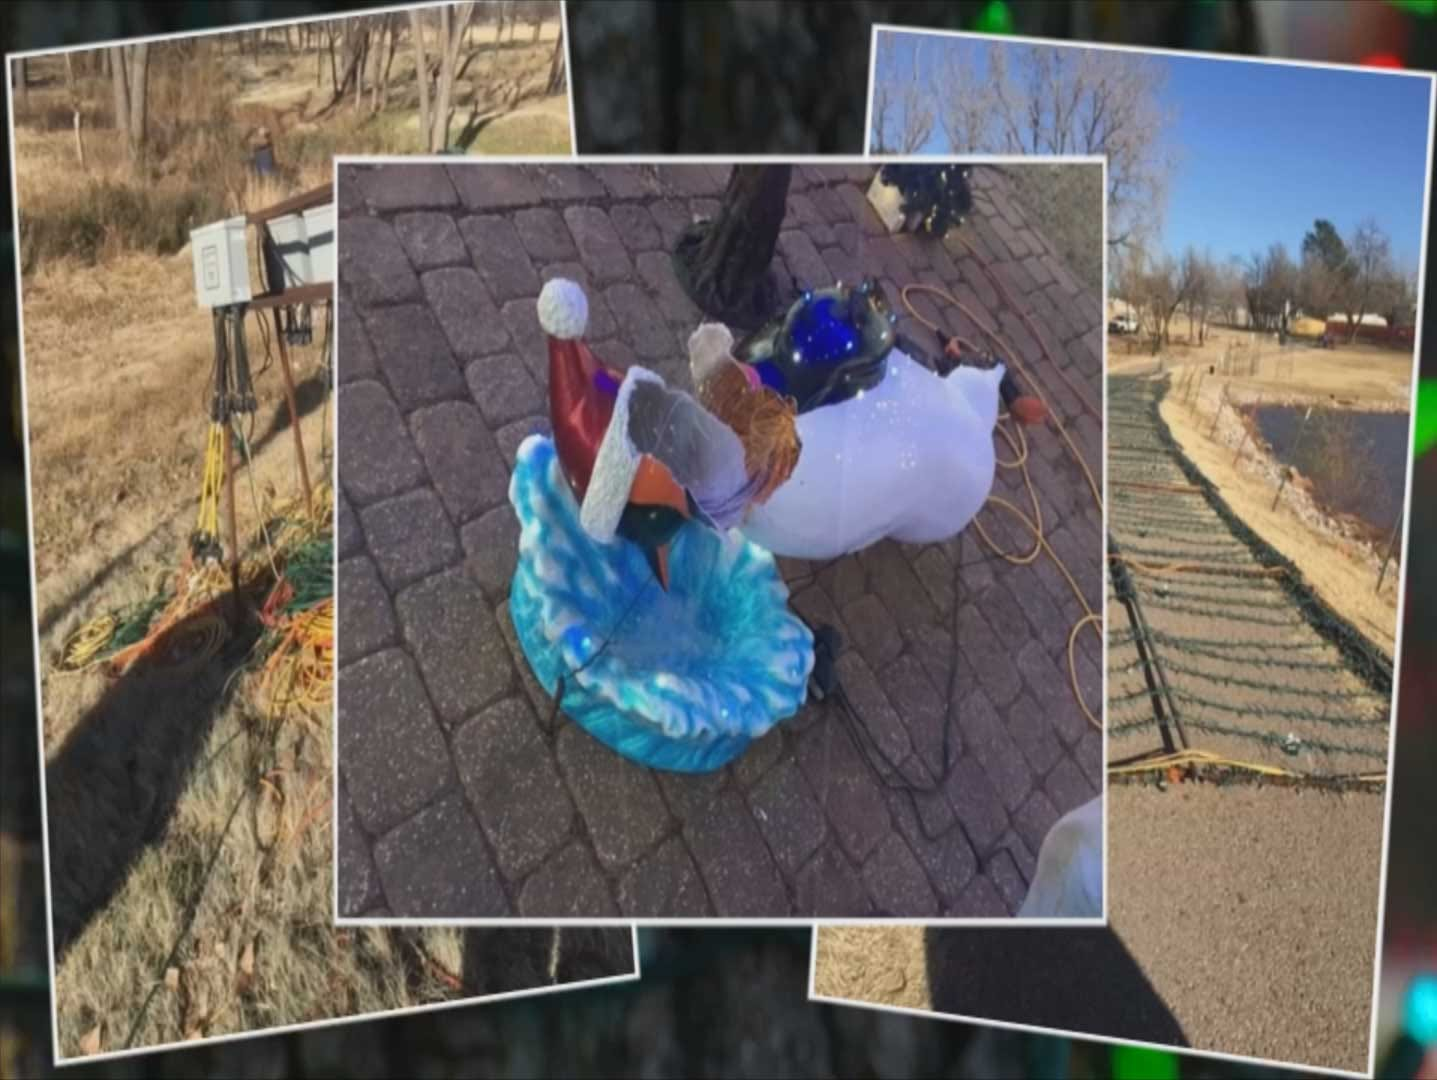 Vandals Target 'Christmas In The Park' In Yukon